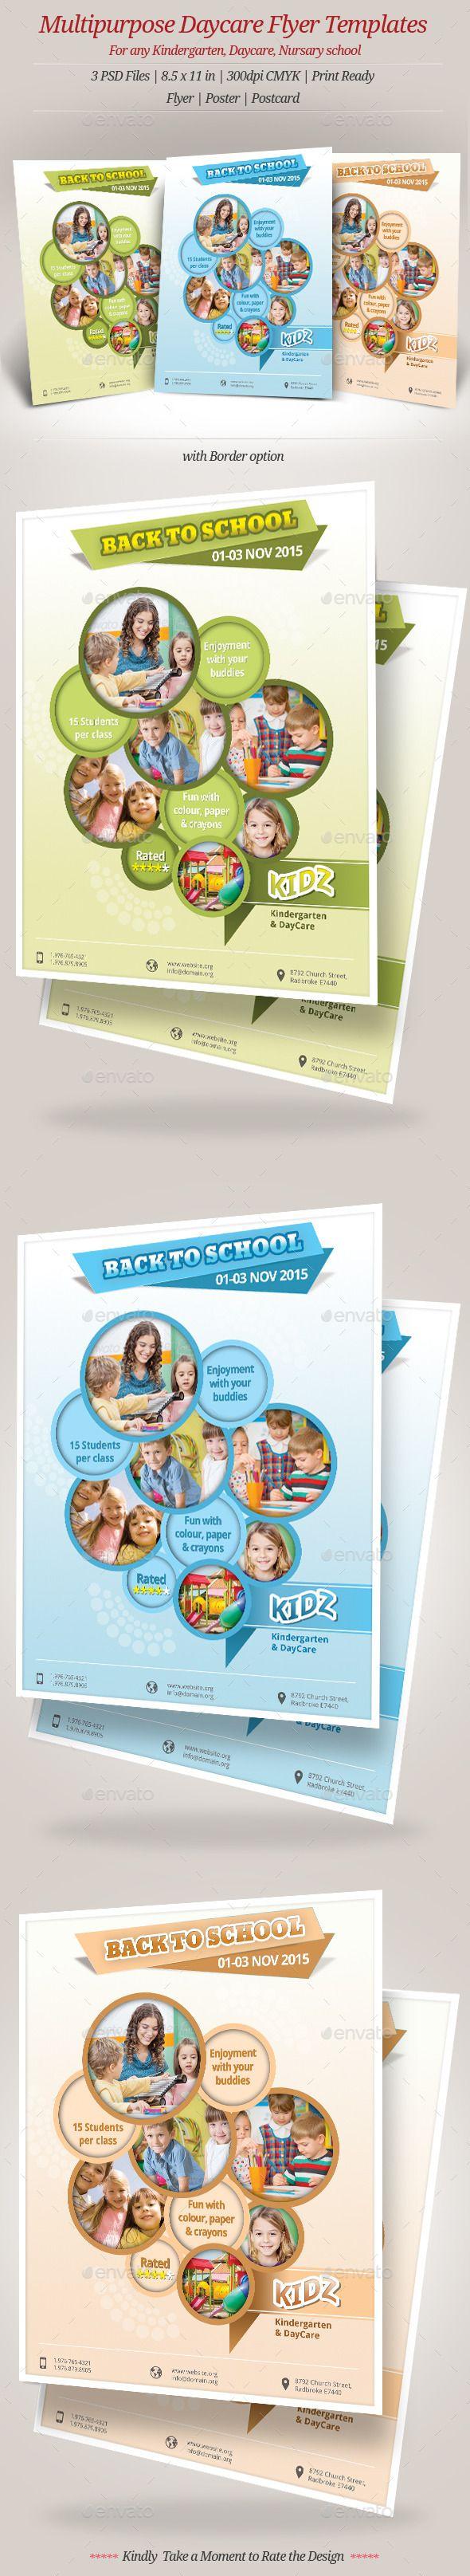 Multipurpose Daycare Flyer Templates. For Kindergarten, Daycare, Preschool  That Needs Clean, Professional, Modern Template Design.